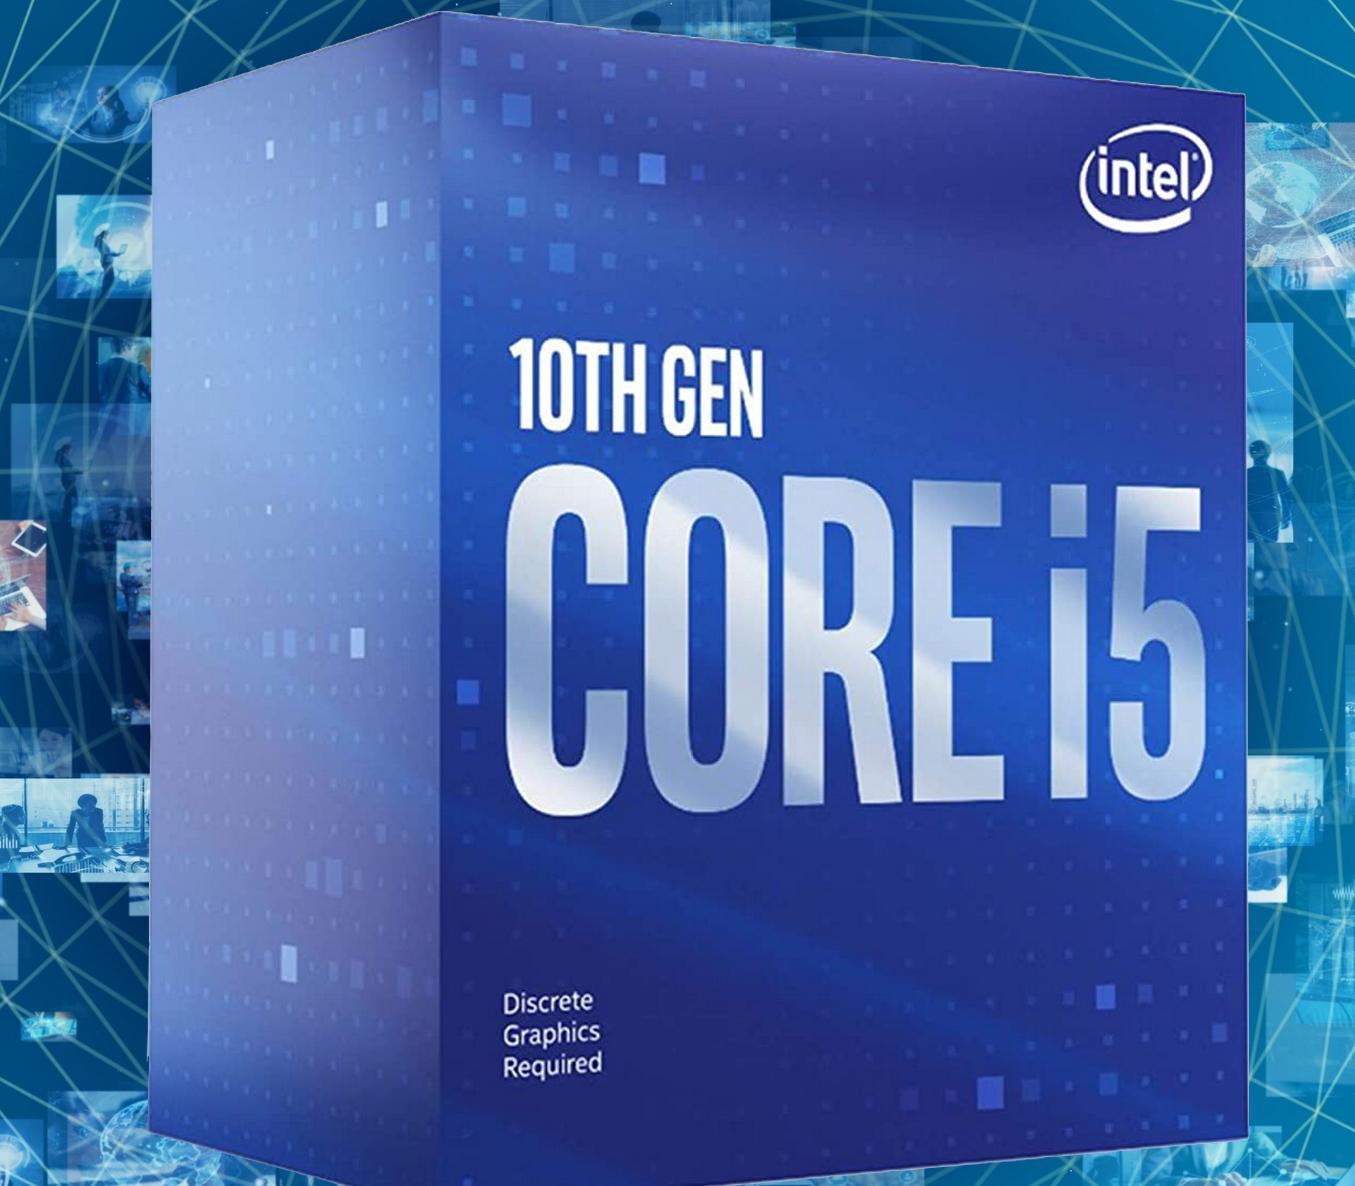 Cyberpuerta: Procesador Intel Core i5-10400F